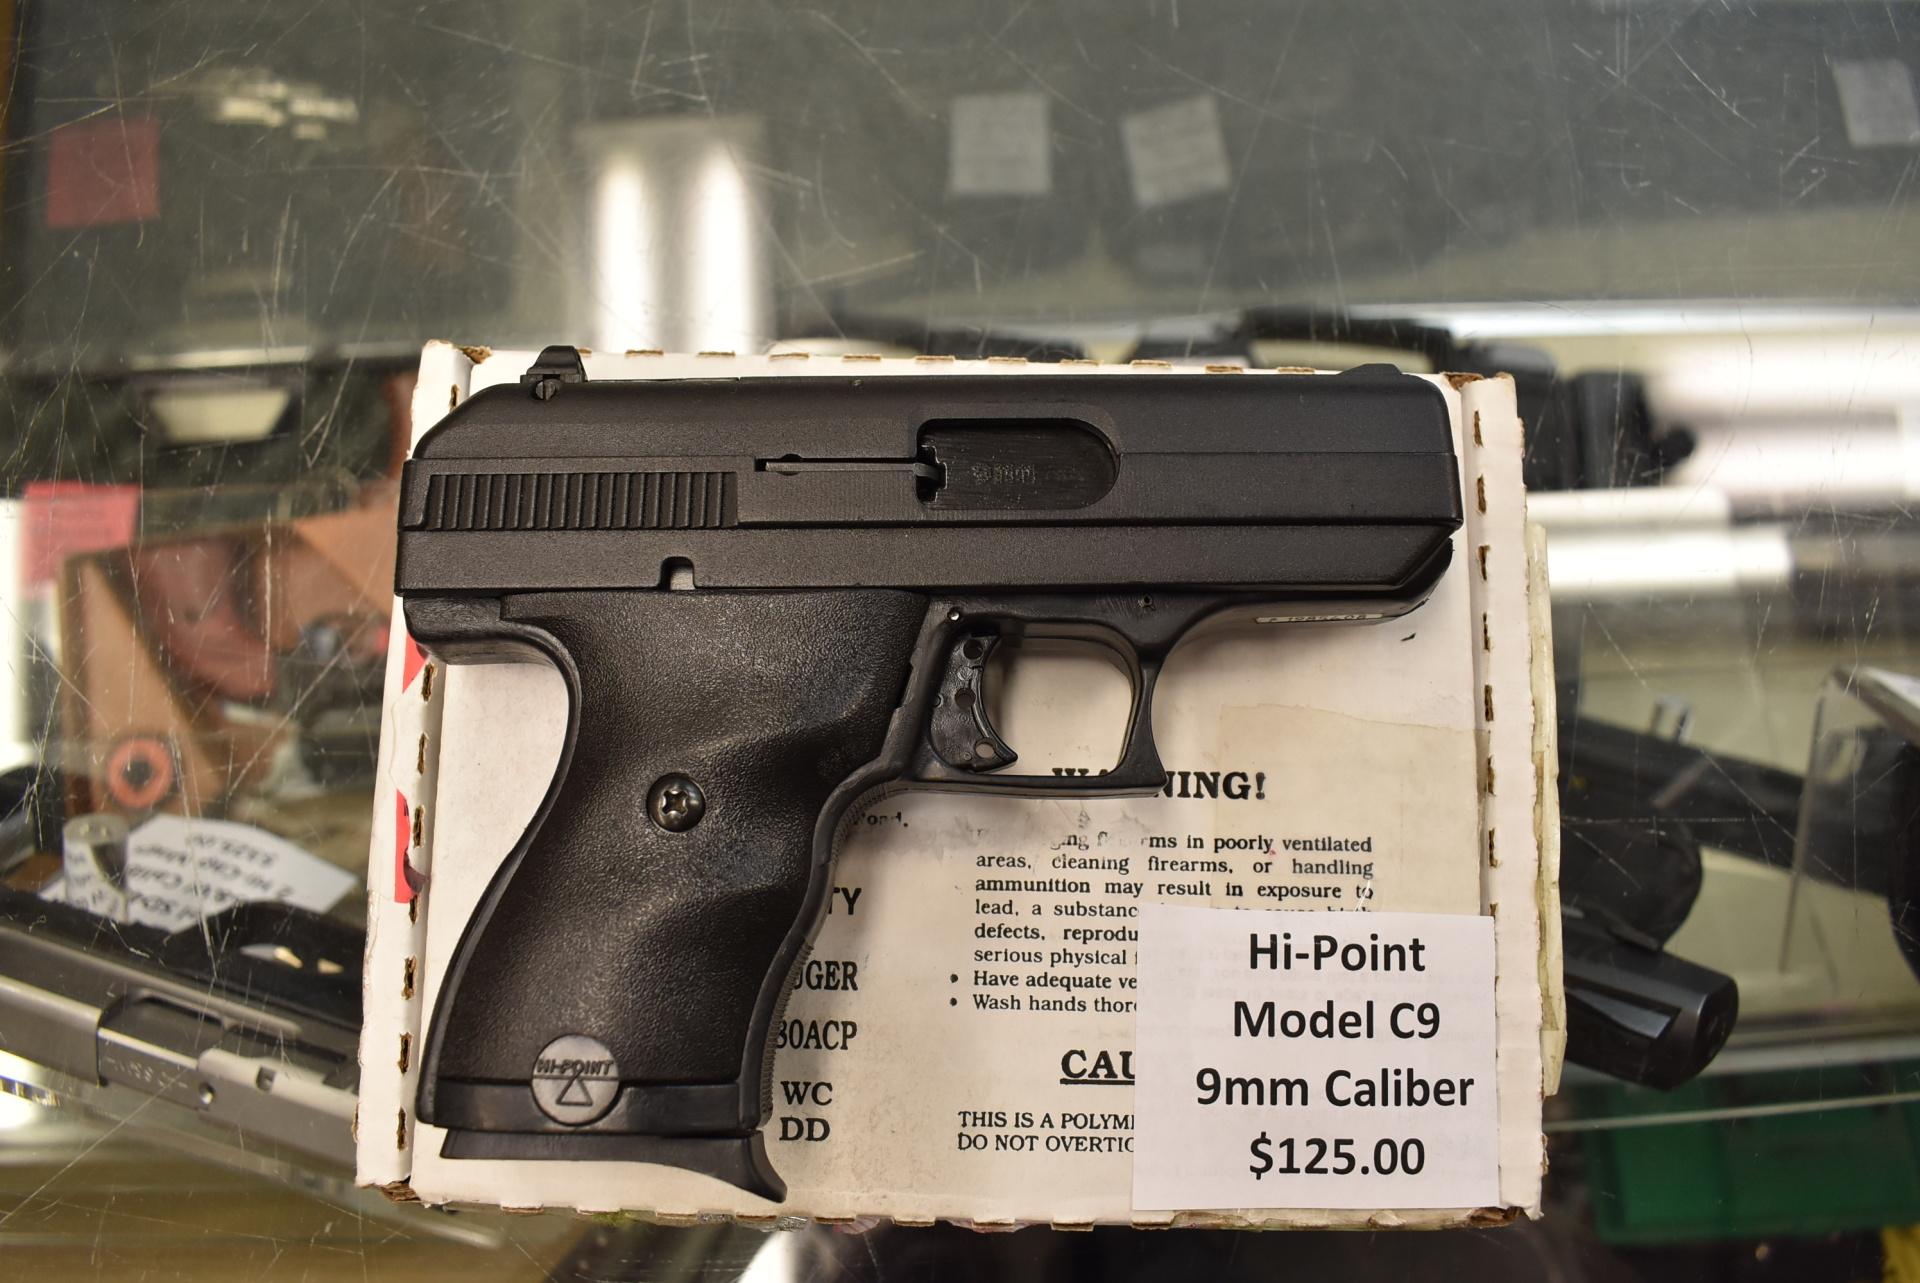 Hi-Point Model C9